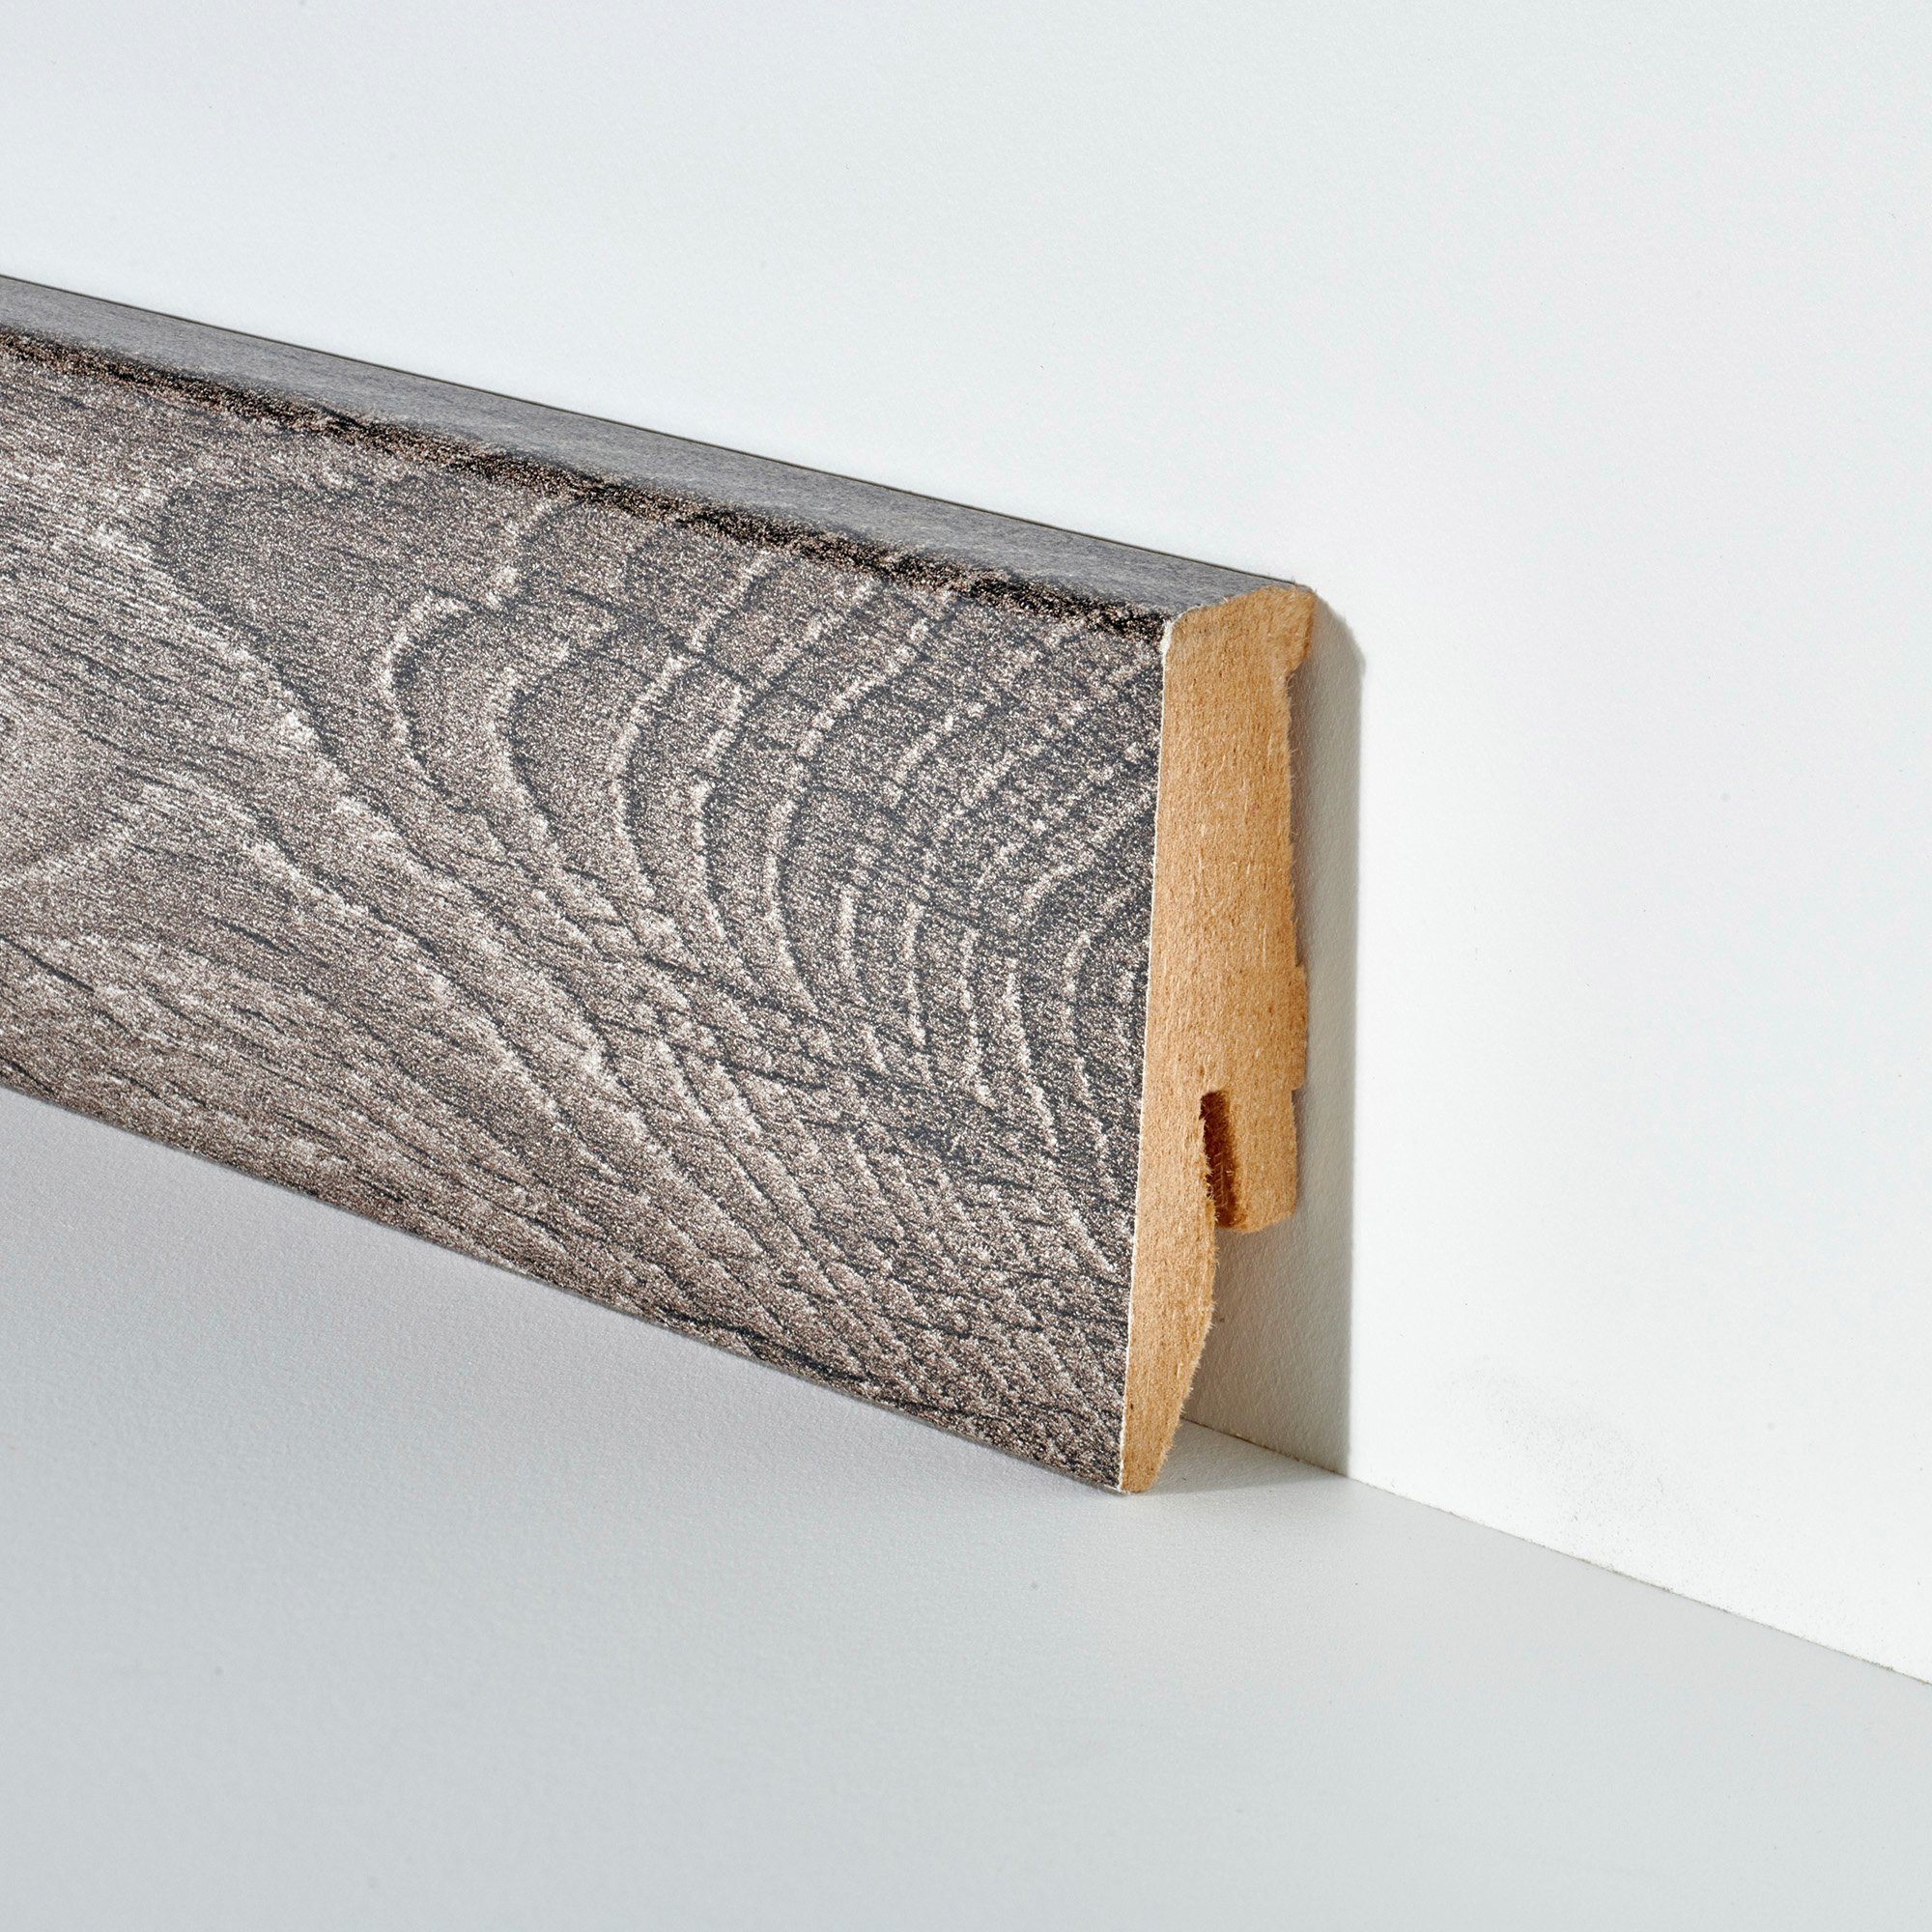 BODENMEISTER Set: Sockelleiste »Eiche grau«, 2er-Pack, Höhe 5,8 cm